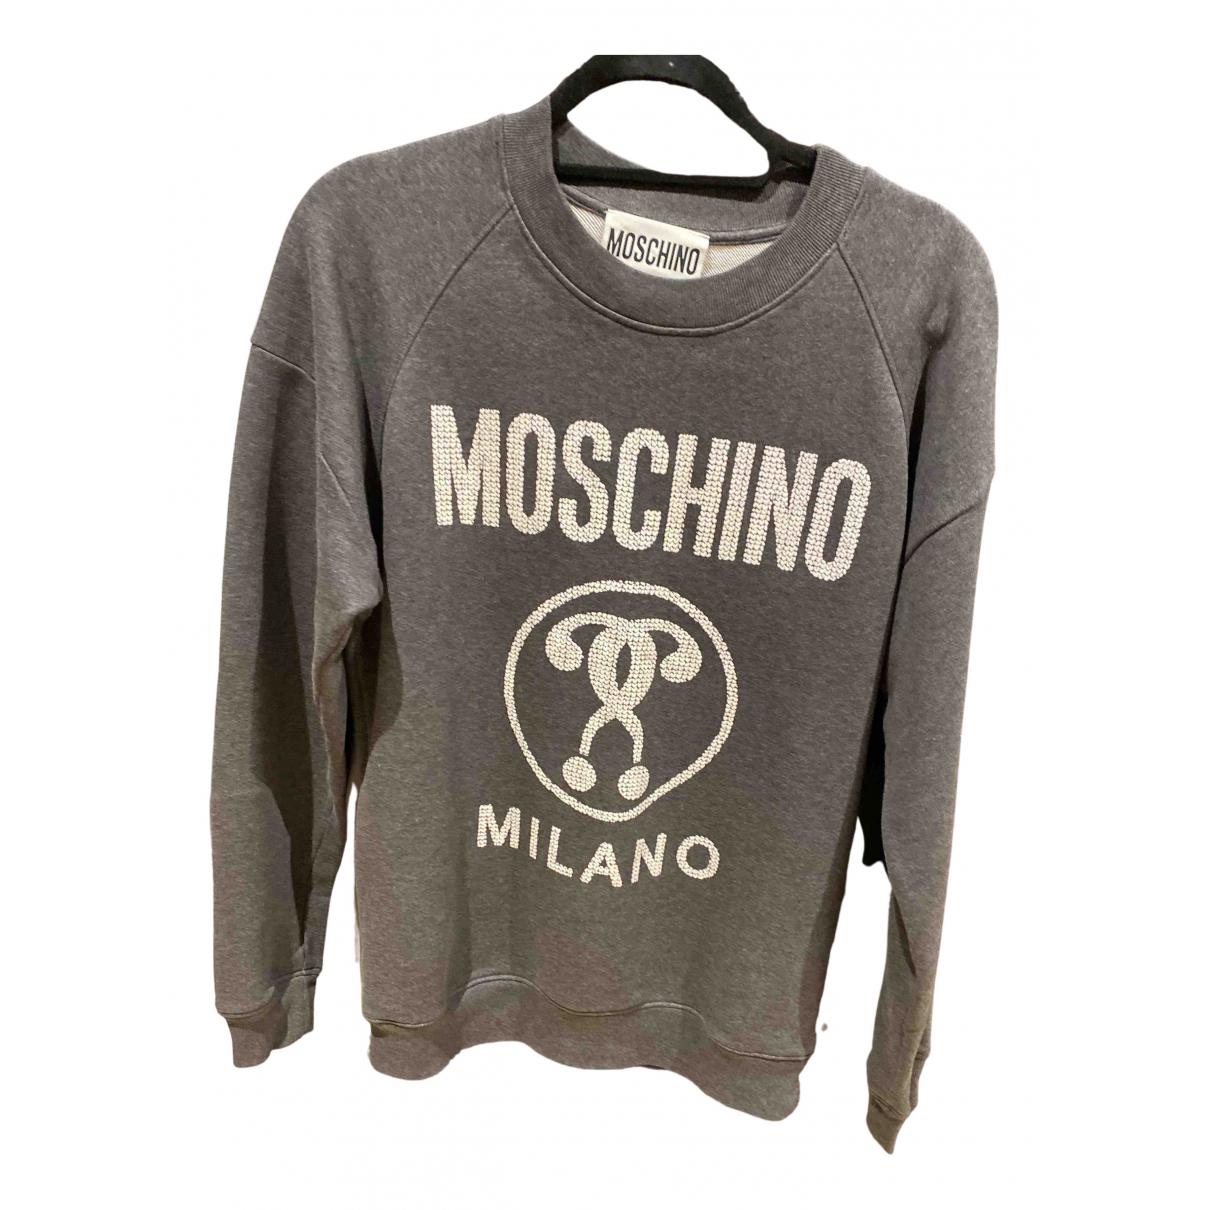 Moschino N Grey Cotton Knitwear & Sweatshirts for Men 36 UK - US